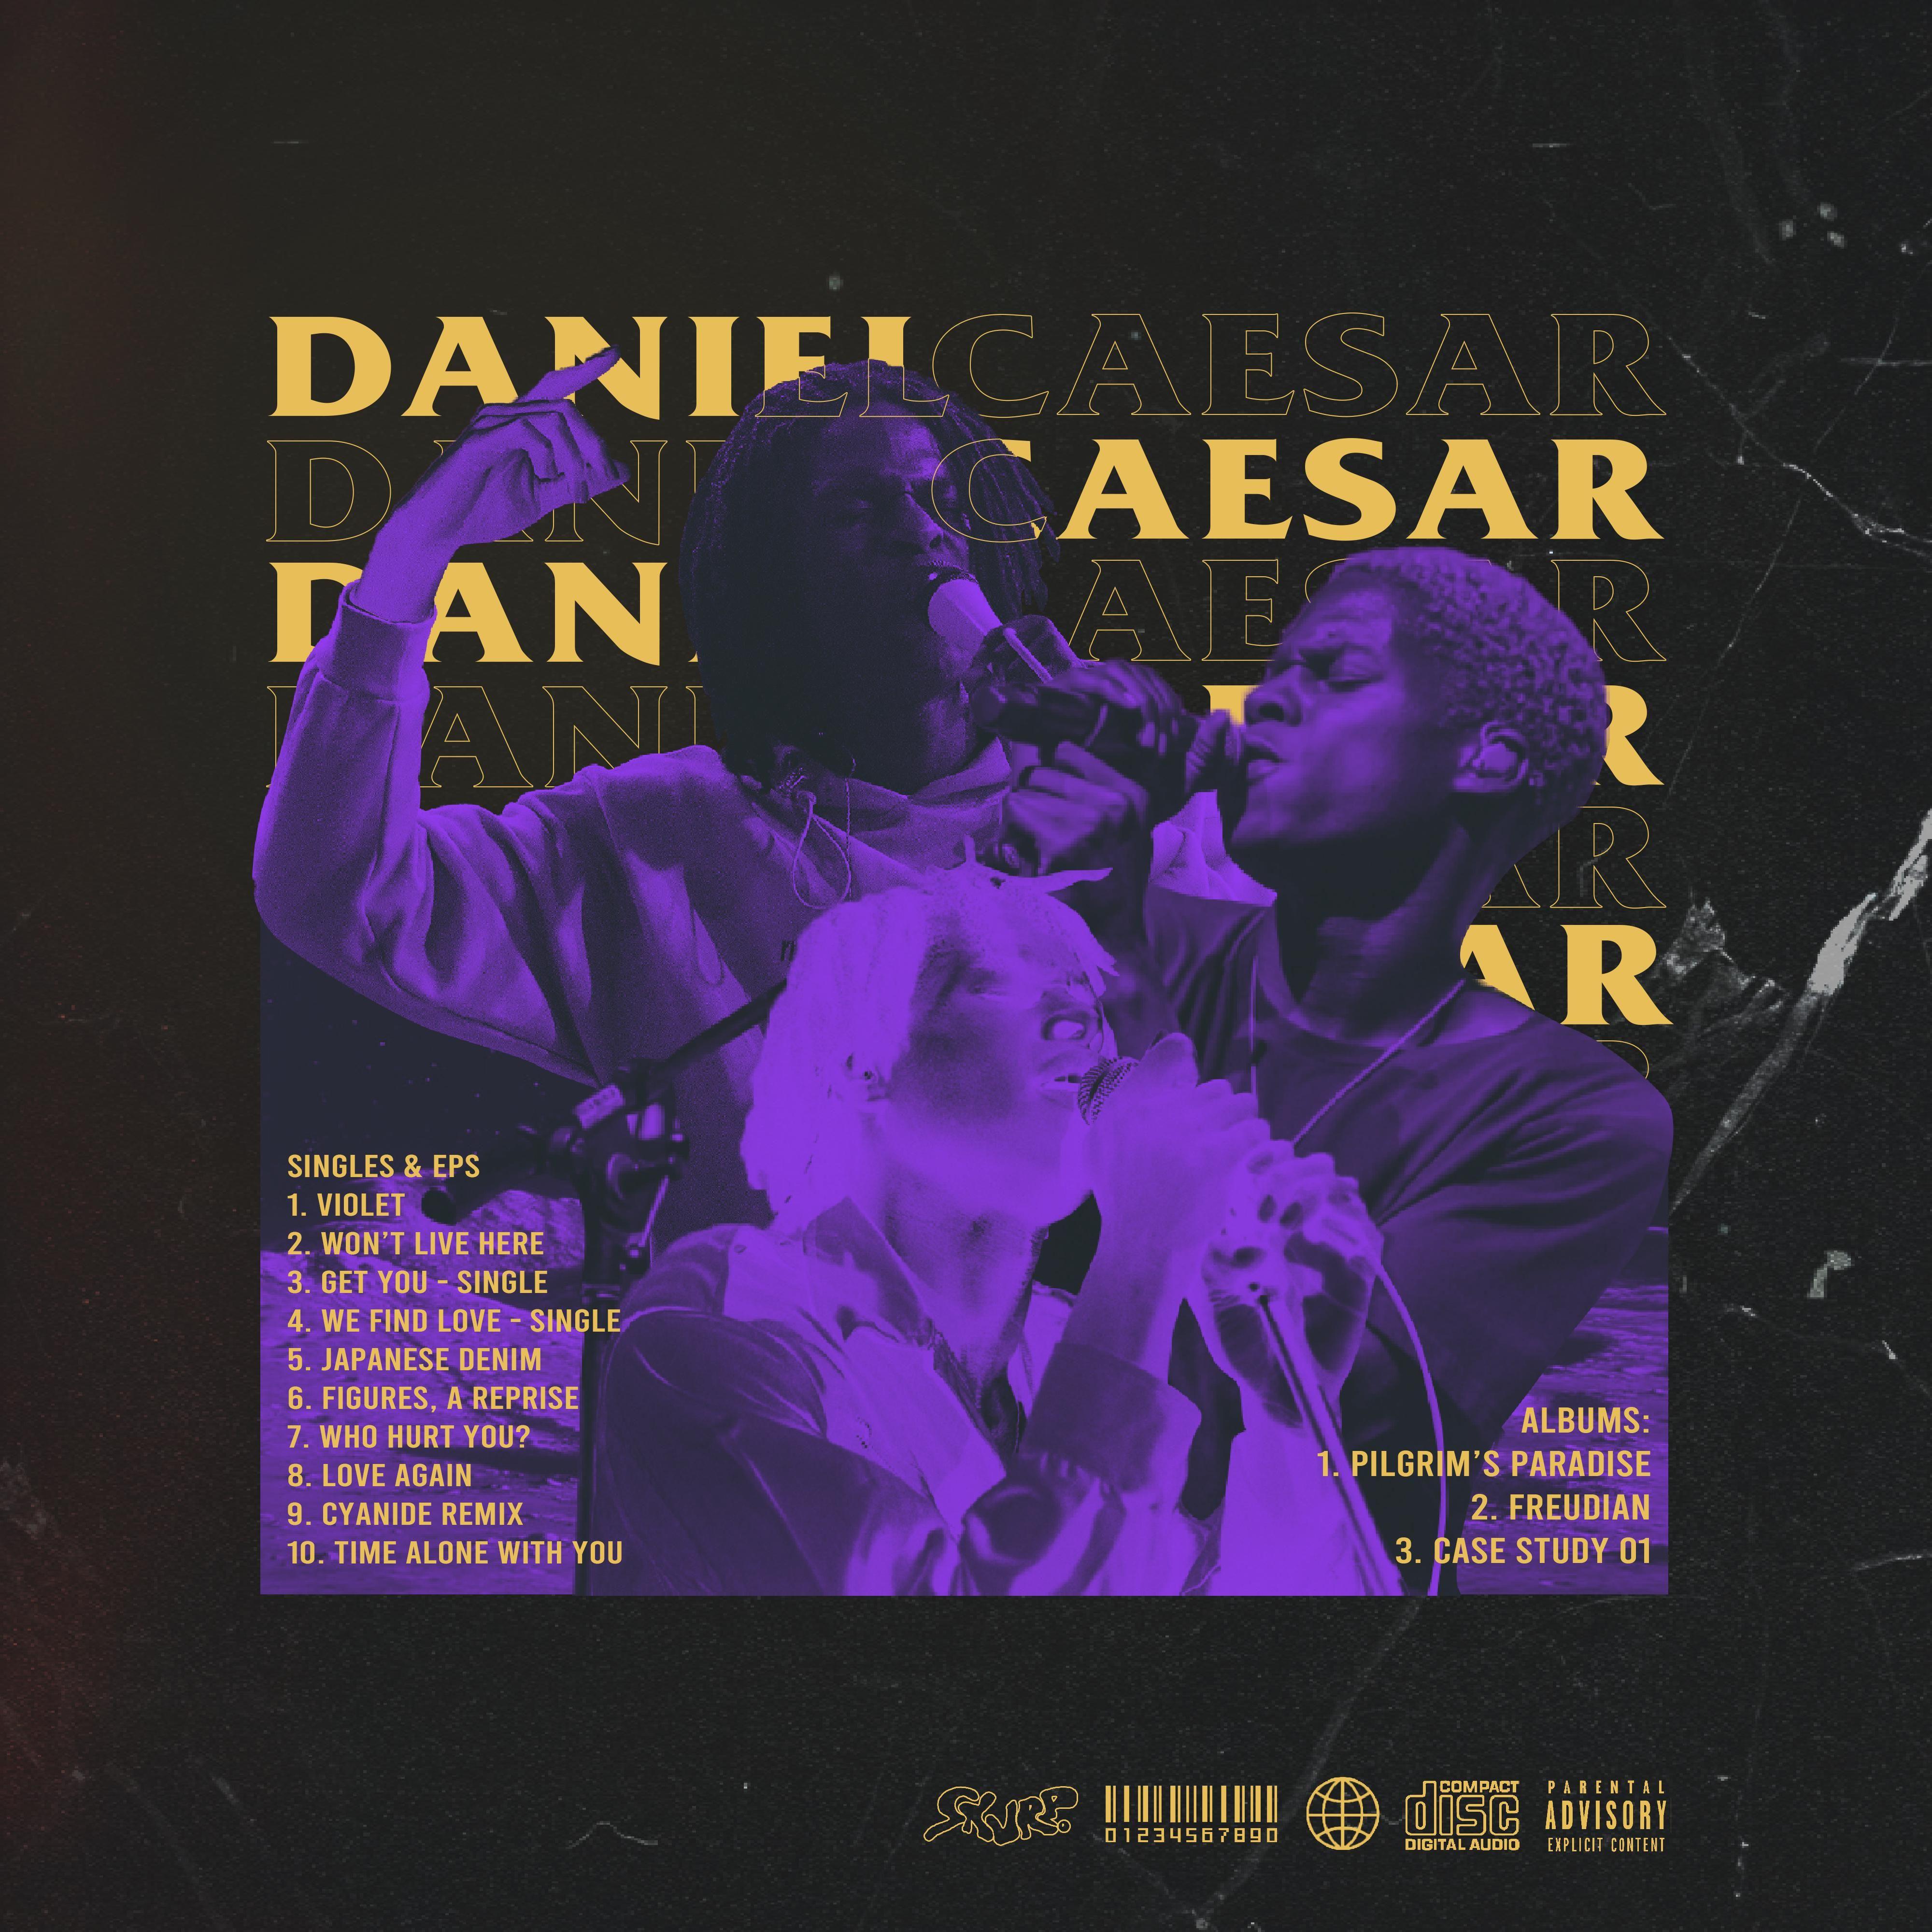 Daniel caesar discography in 2020 music collage daniel